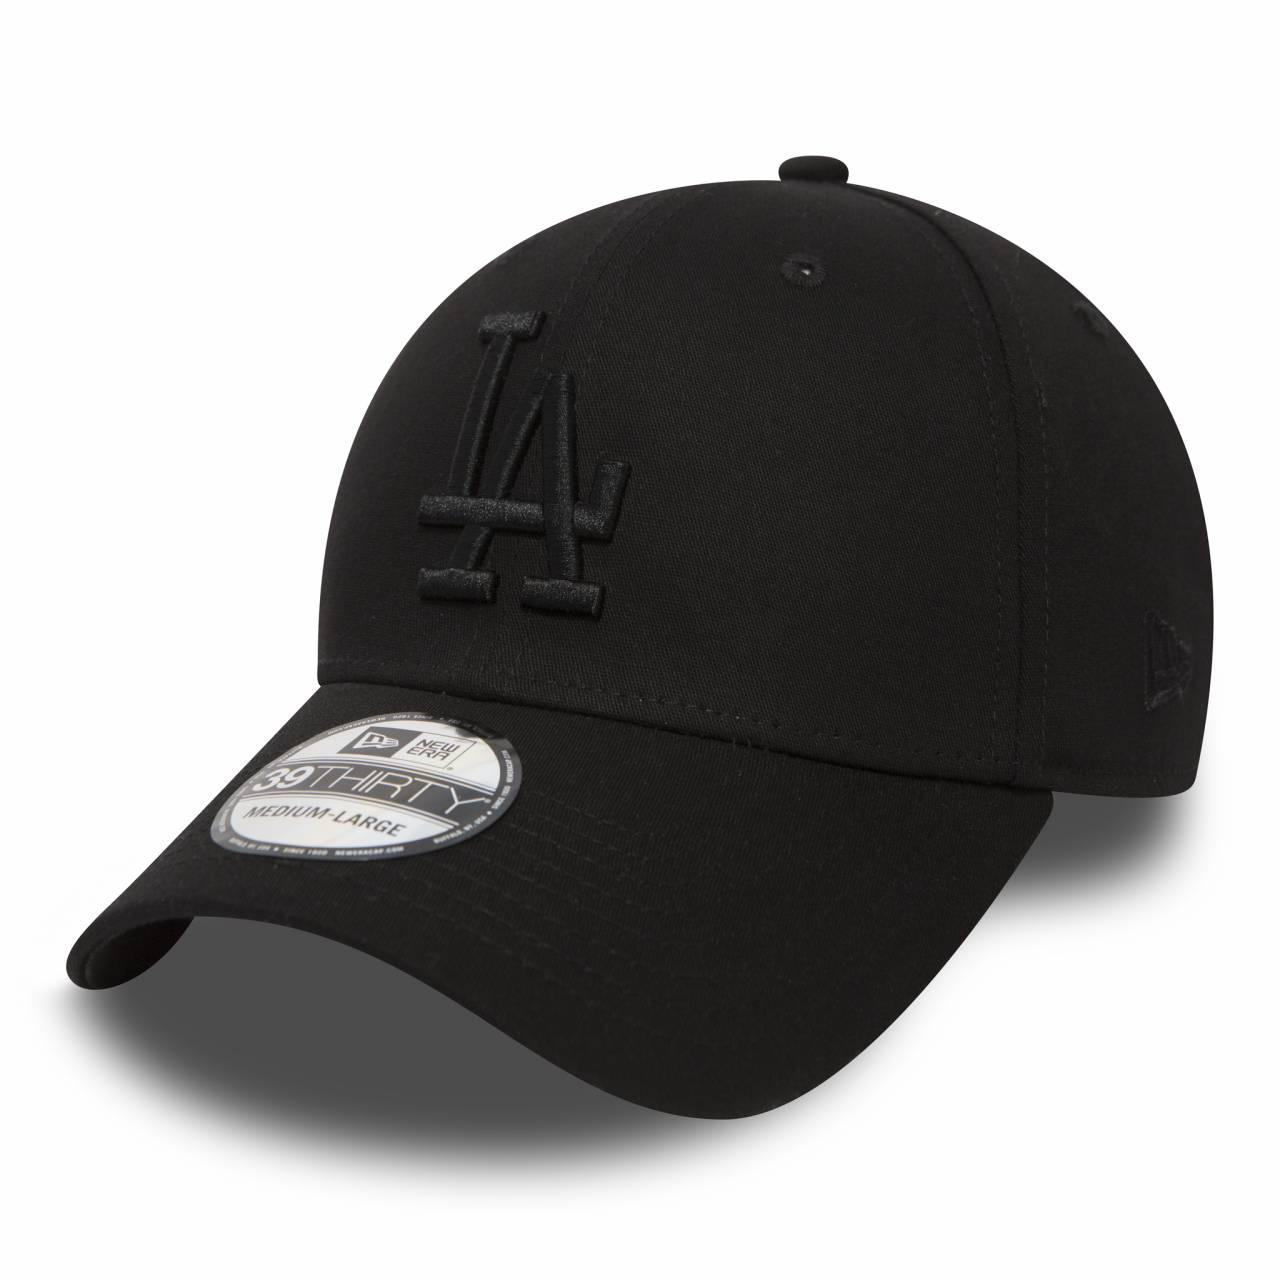 11405496 39THIRTY LOS ANGELES DODGERS STRETCH BLACK/BLACK CAP